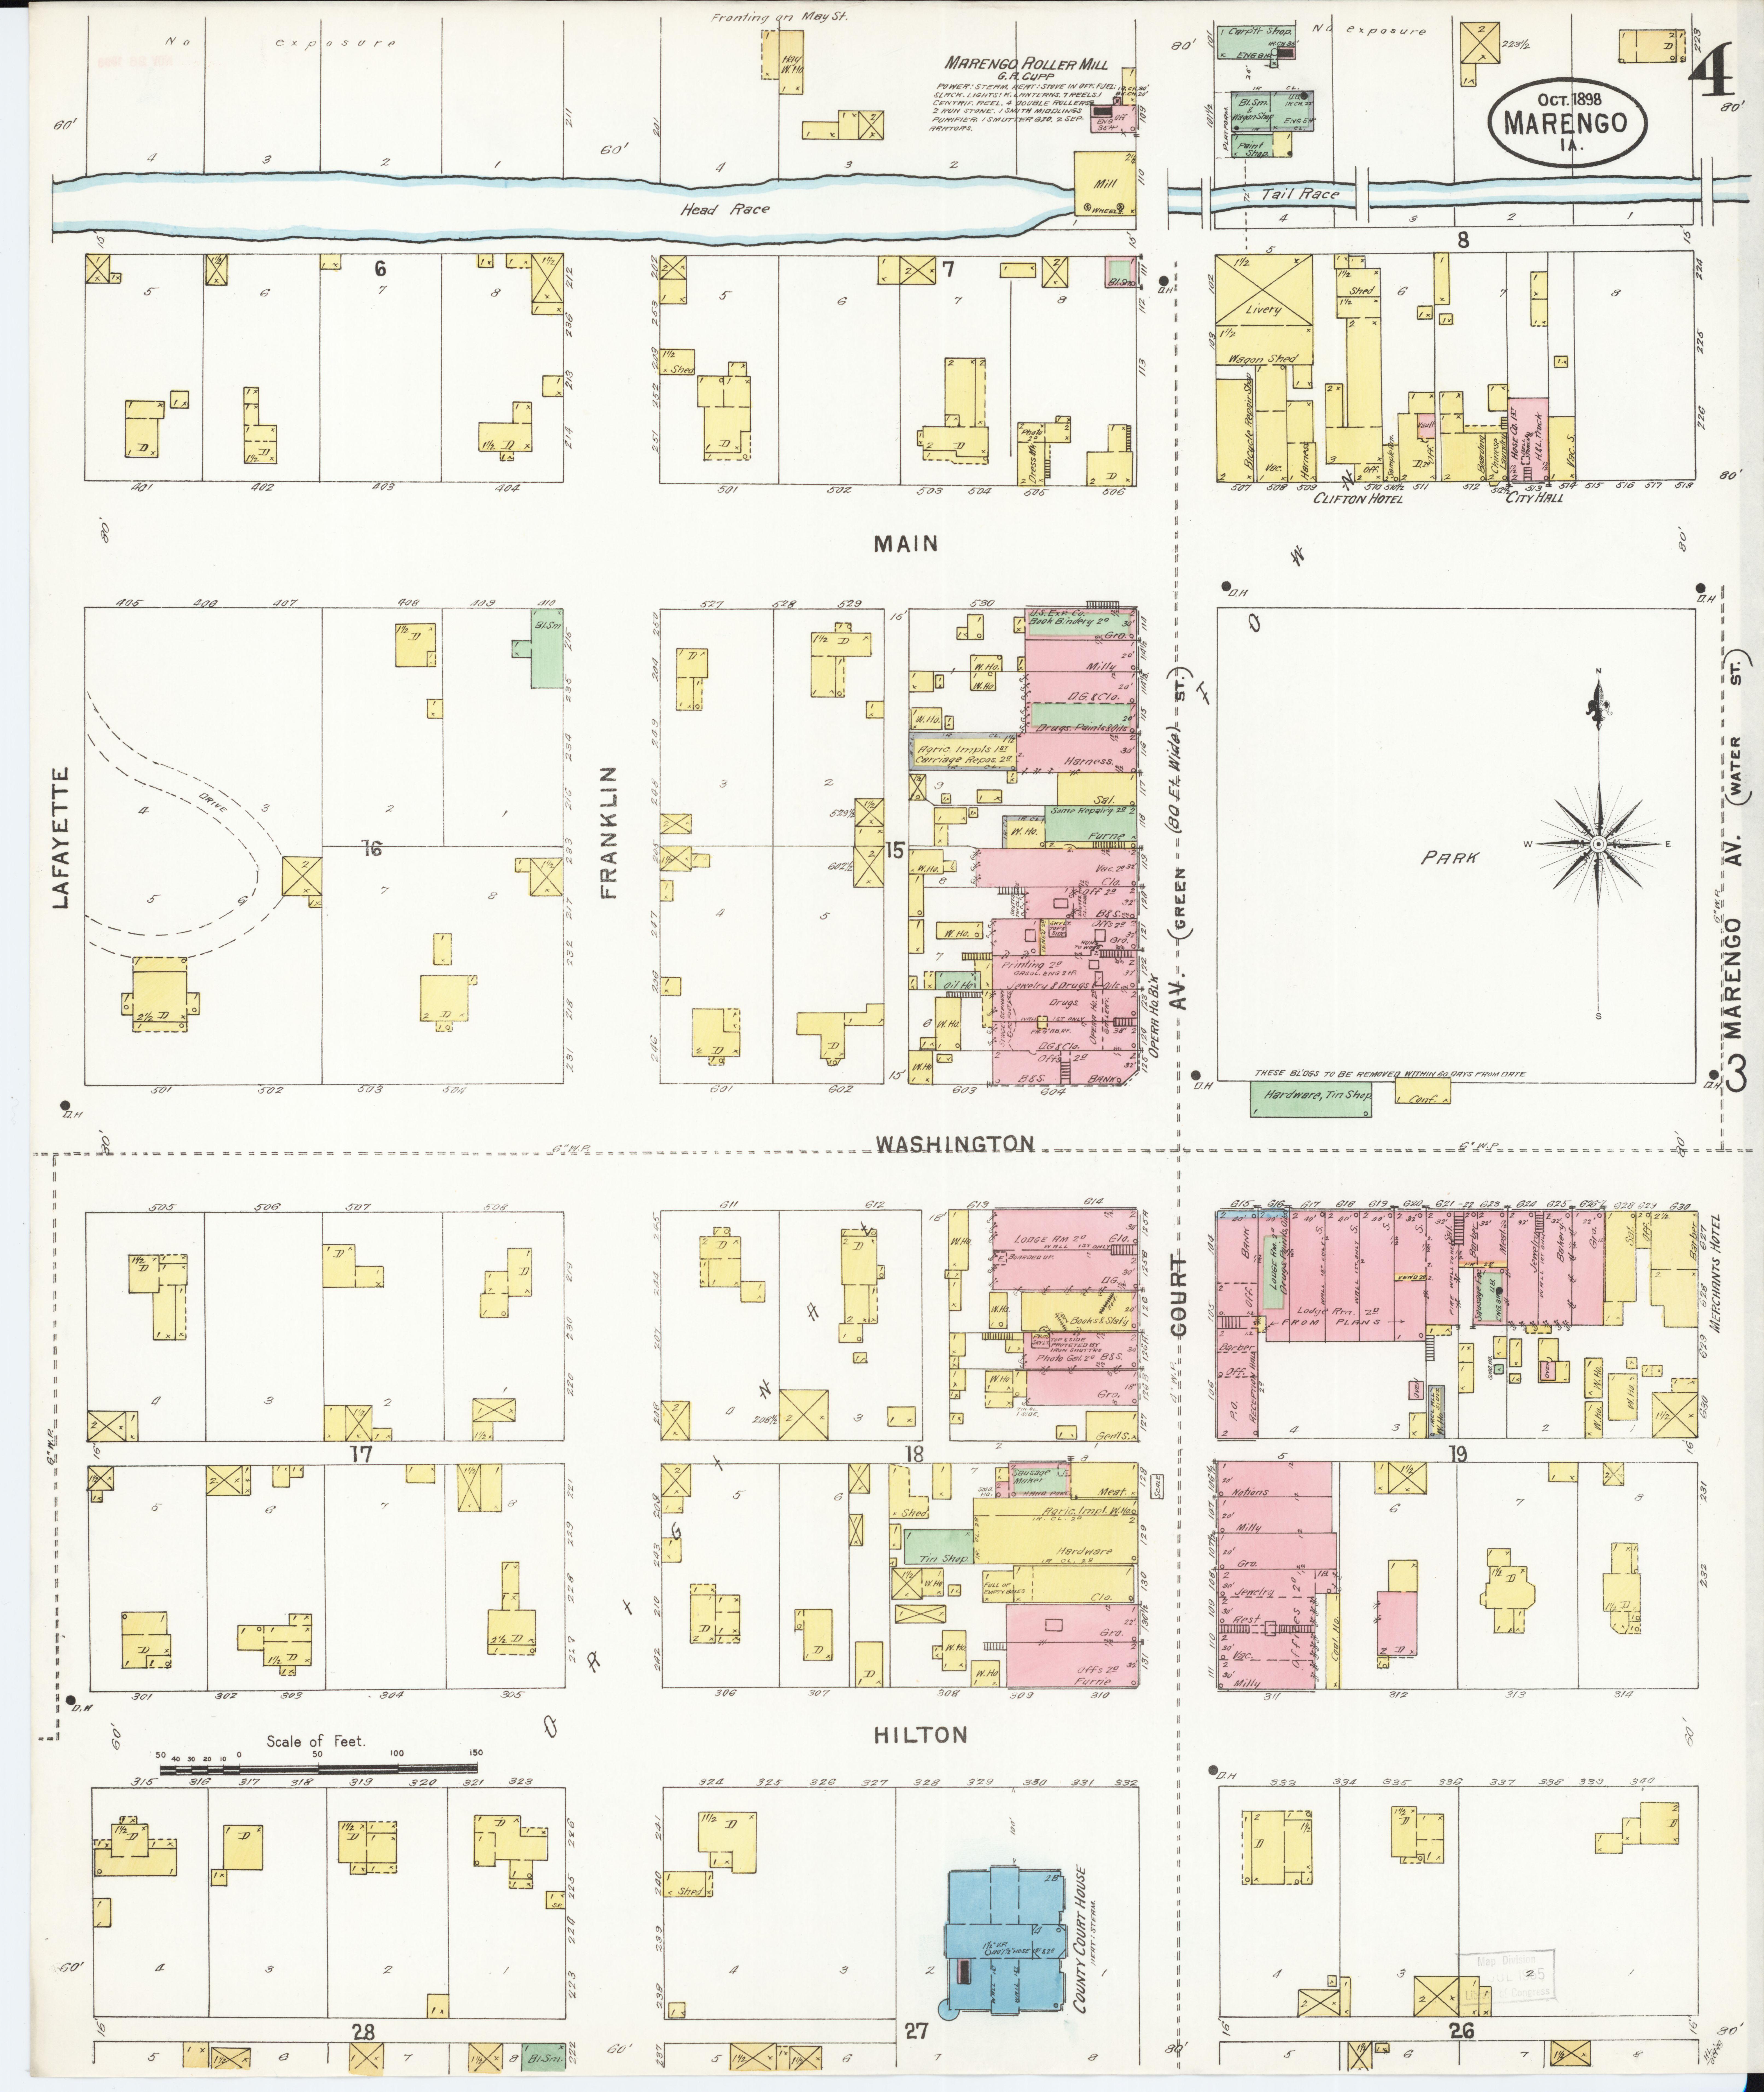 Iowa County Iowa Map.File Sanborn Fire Insurance Map From Marengo Iowa County Iowa Loc